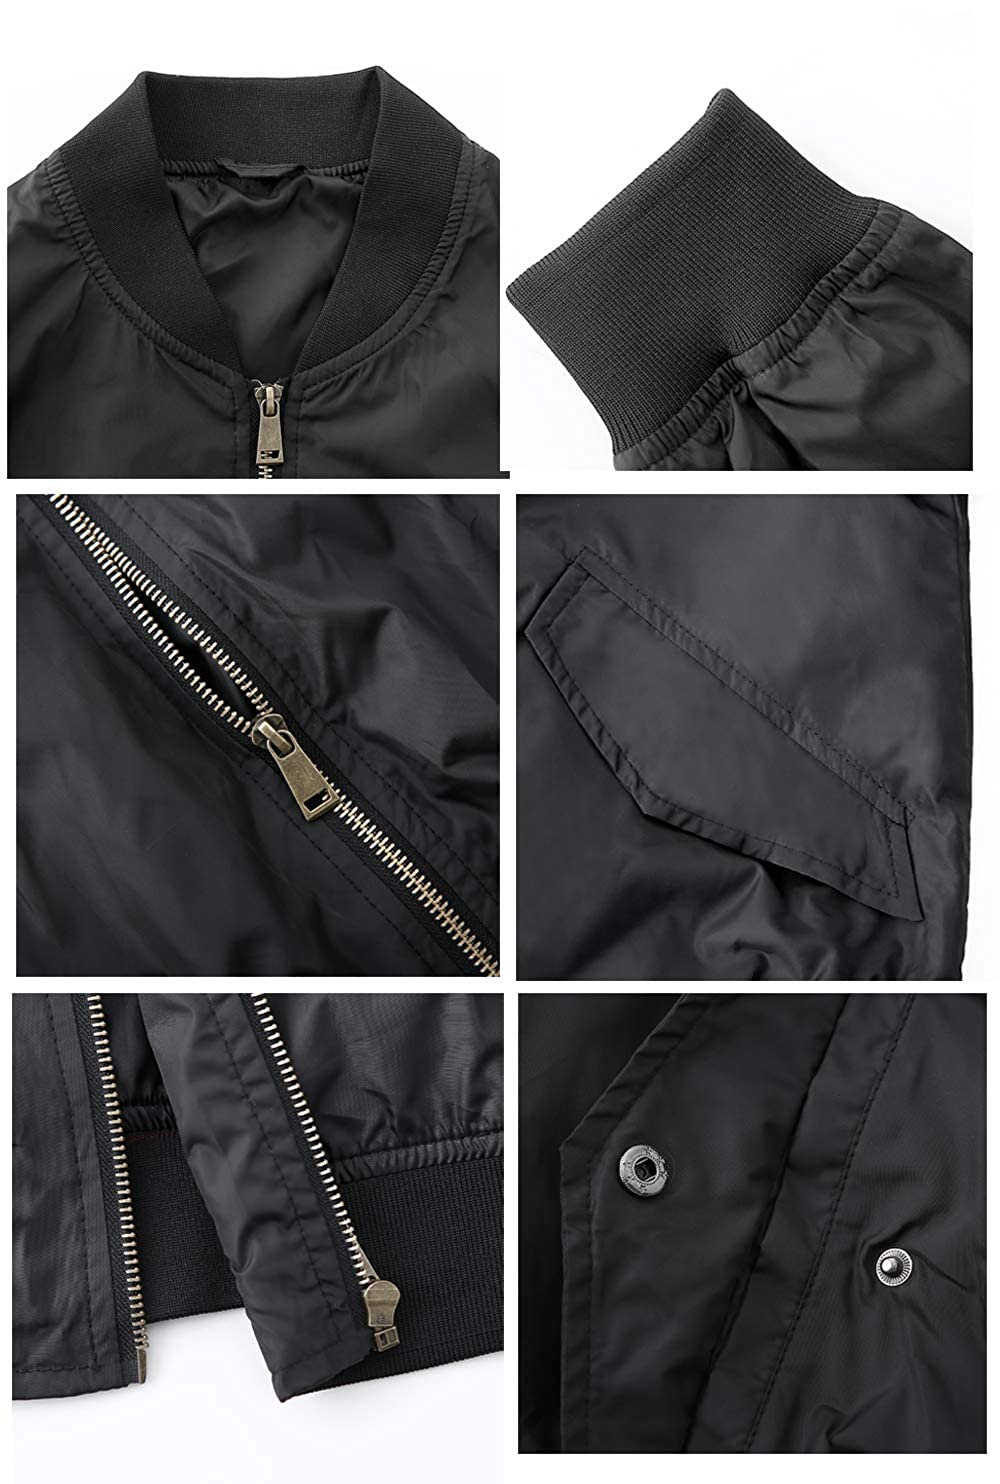 MADHERO Mens Lightweight Bomber Jacket Slim Fit Softshell Windbreaker NMA-1